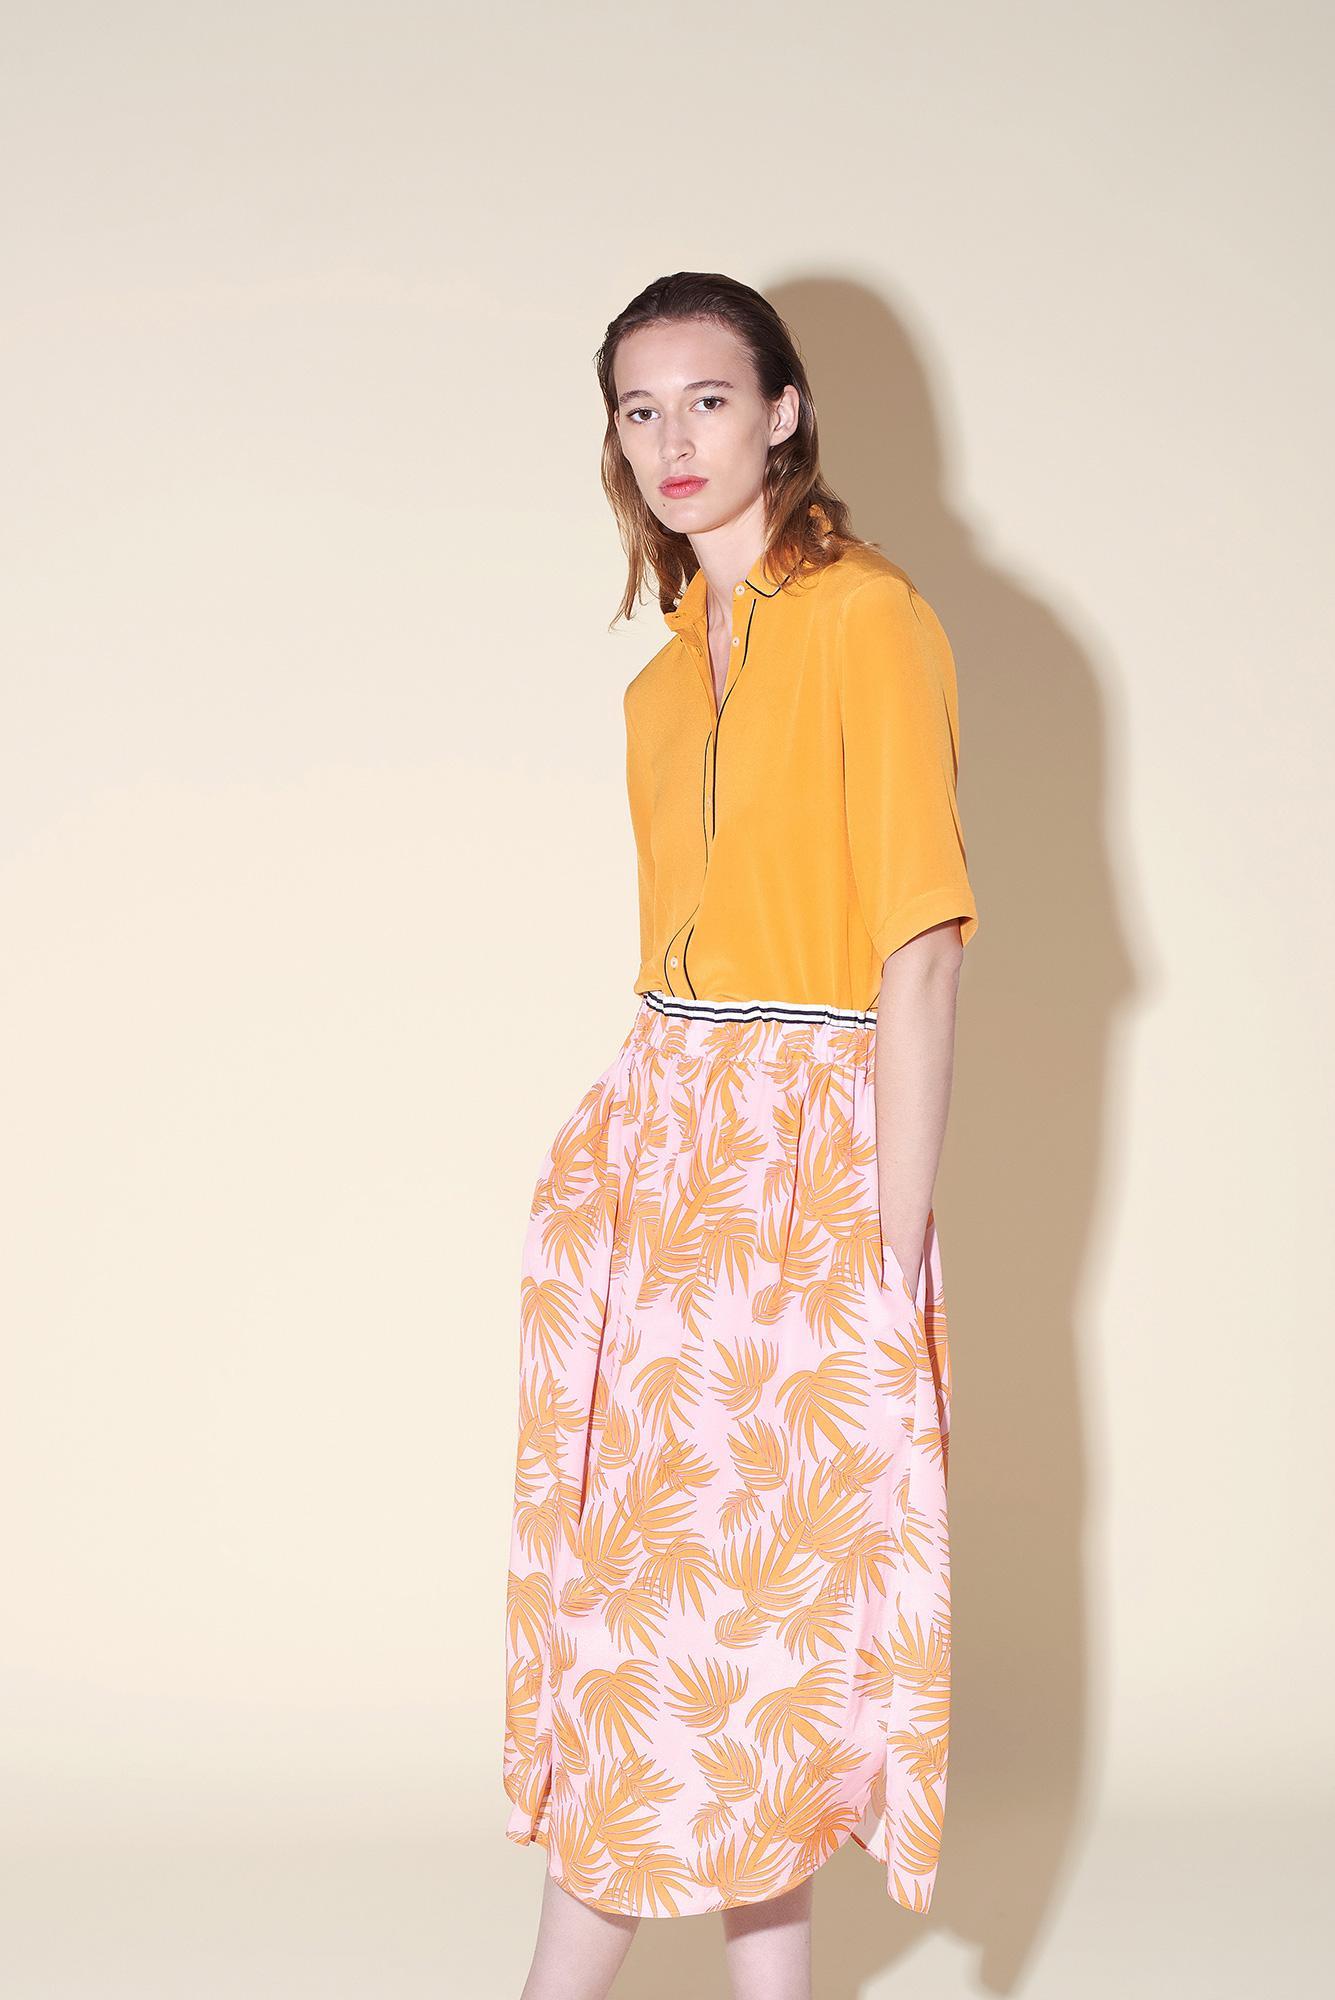 Small collar shirt silk crepe orange – Long skirt silk crepe tropical orange